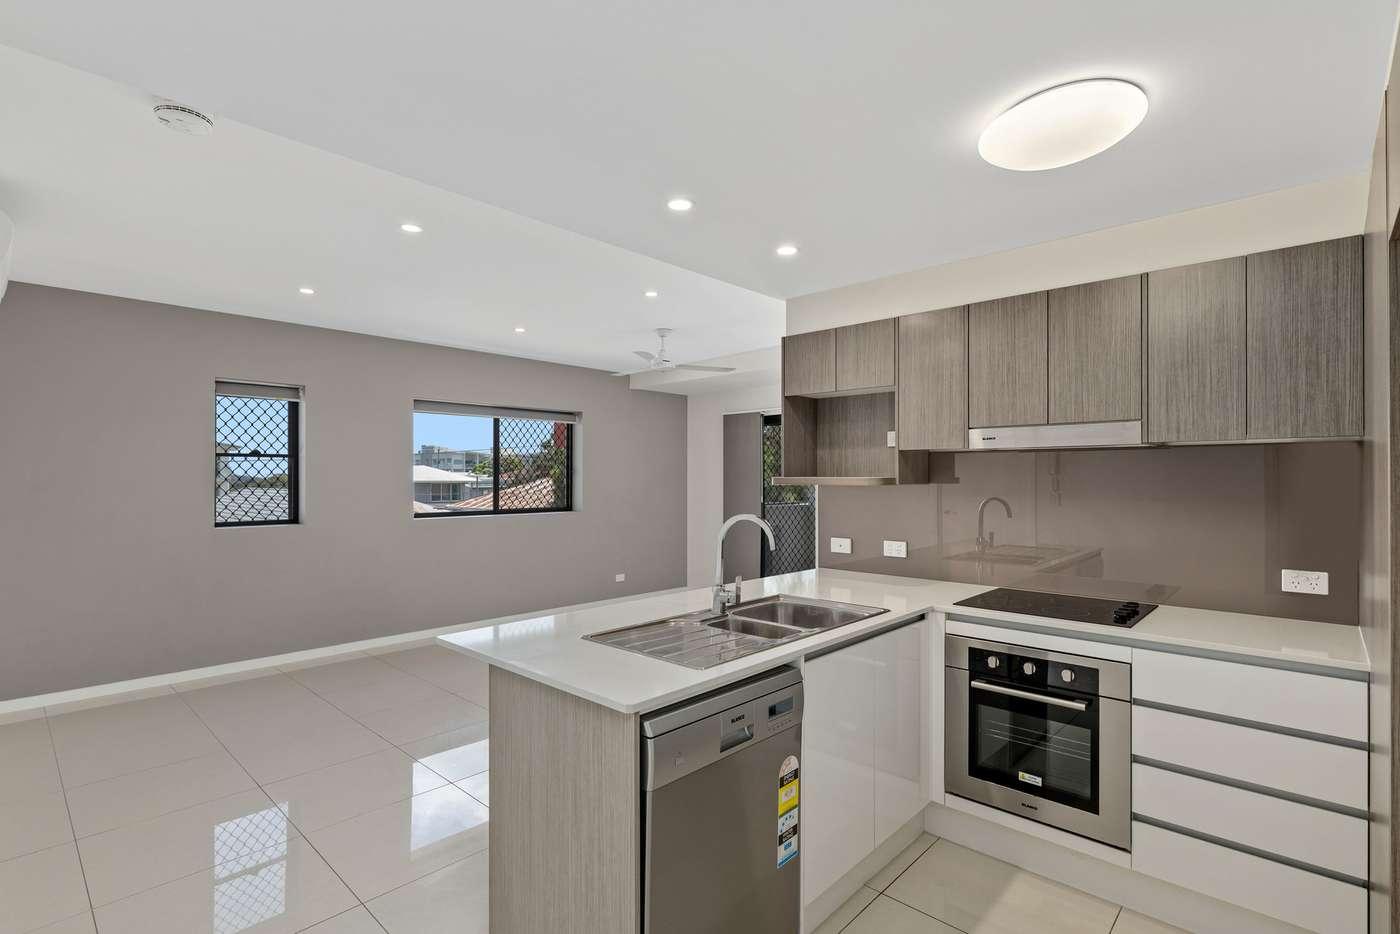 Main view of Homely apartment listing, 19/11 Lindwall Street, Upper Mount Gravatt QLD 4122